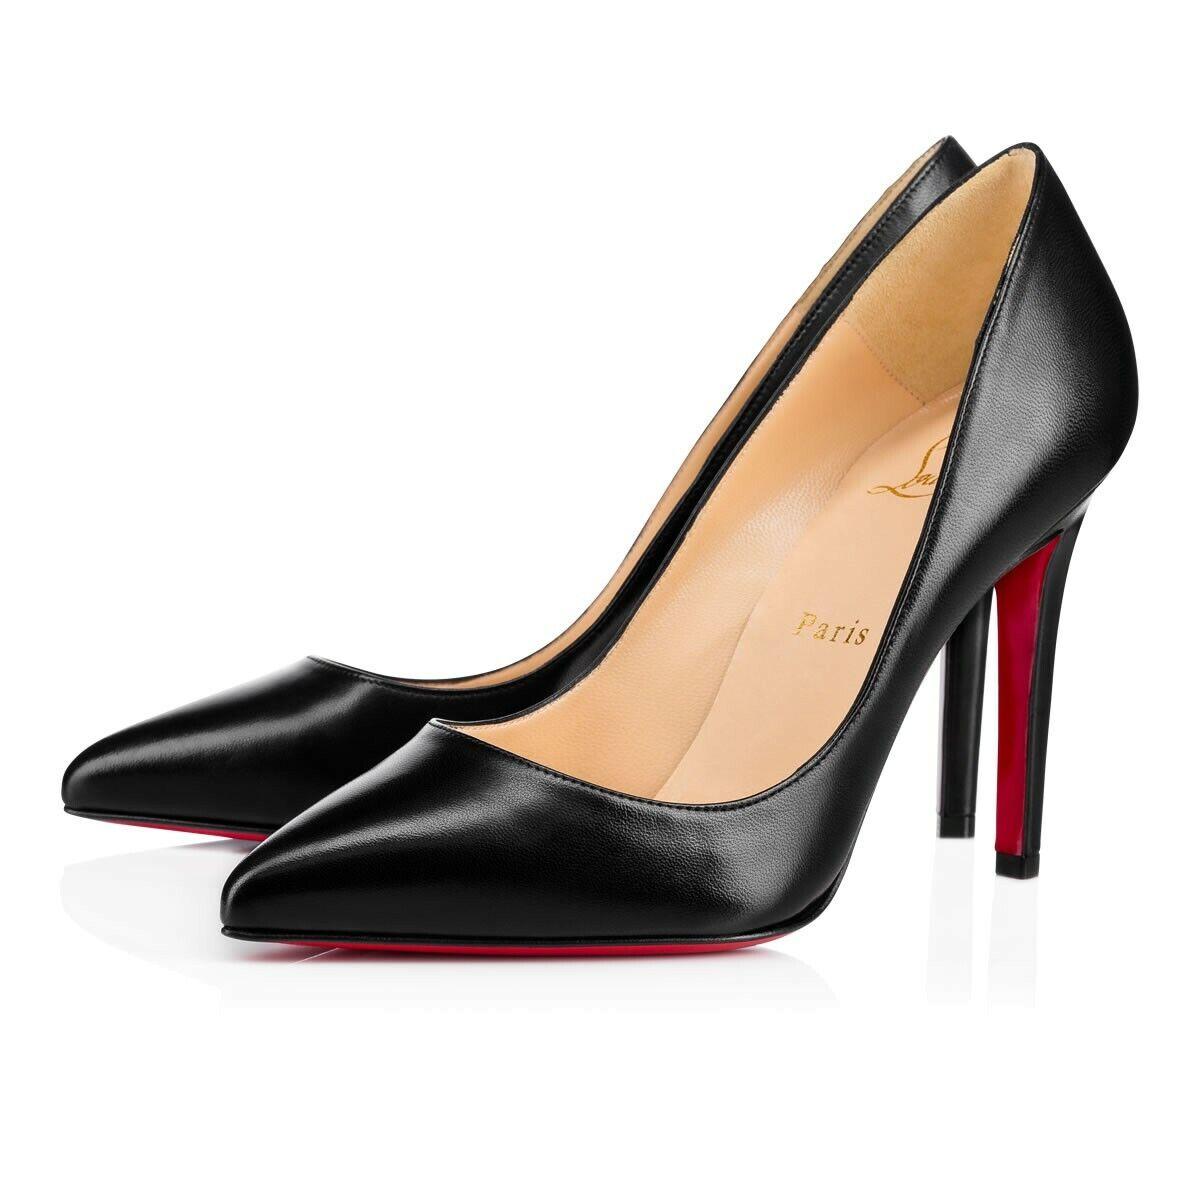 CHRISTIAN LOUBOUTIN 100mm Pigalle Black Leather VE Stiletto Pump Heel 36 6 5.5